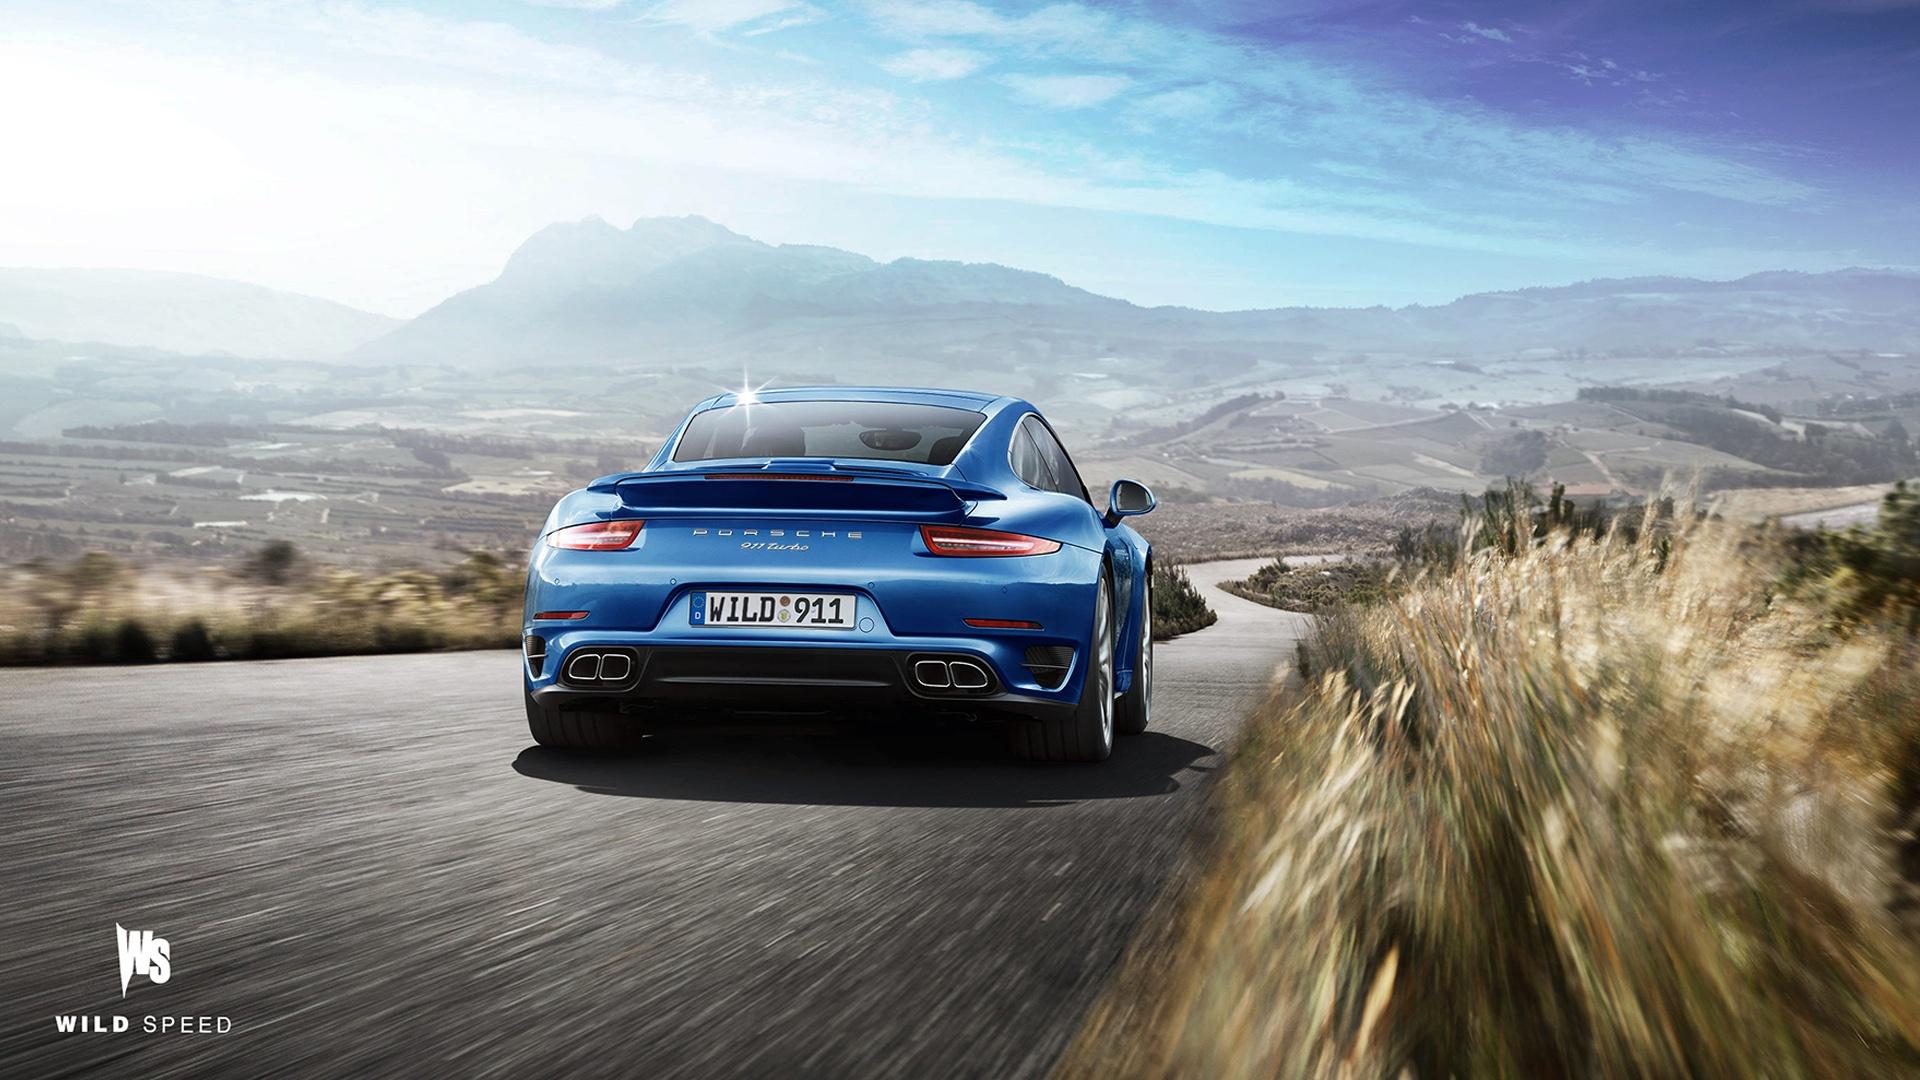 2014 porsche 911 turbo wallpaper hd car wallpapers - Porsche 911 Turbo Wallpaper Iphone